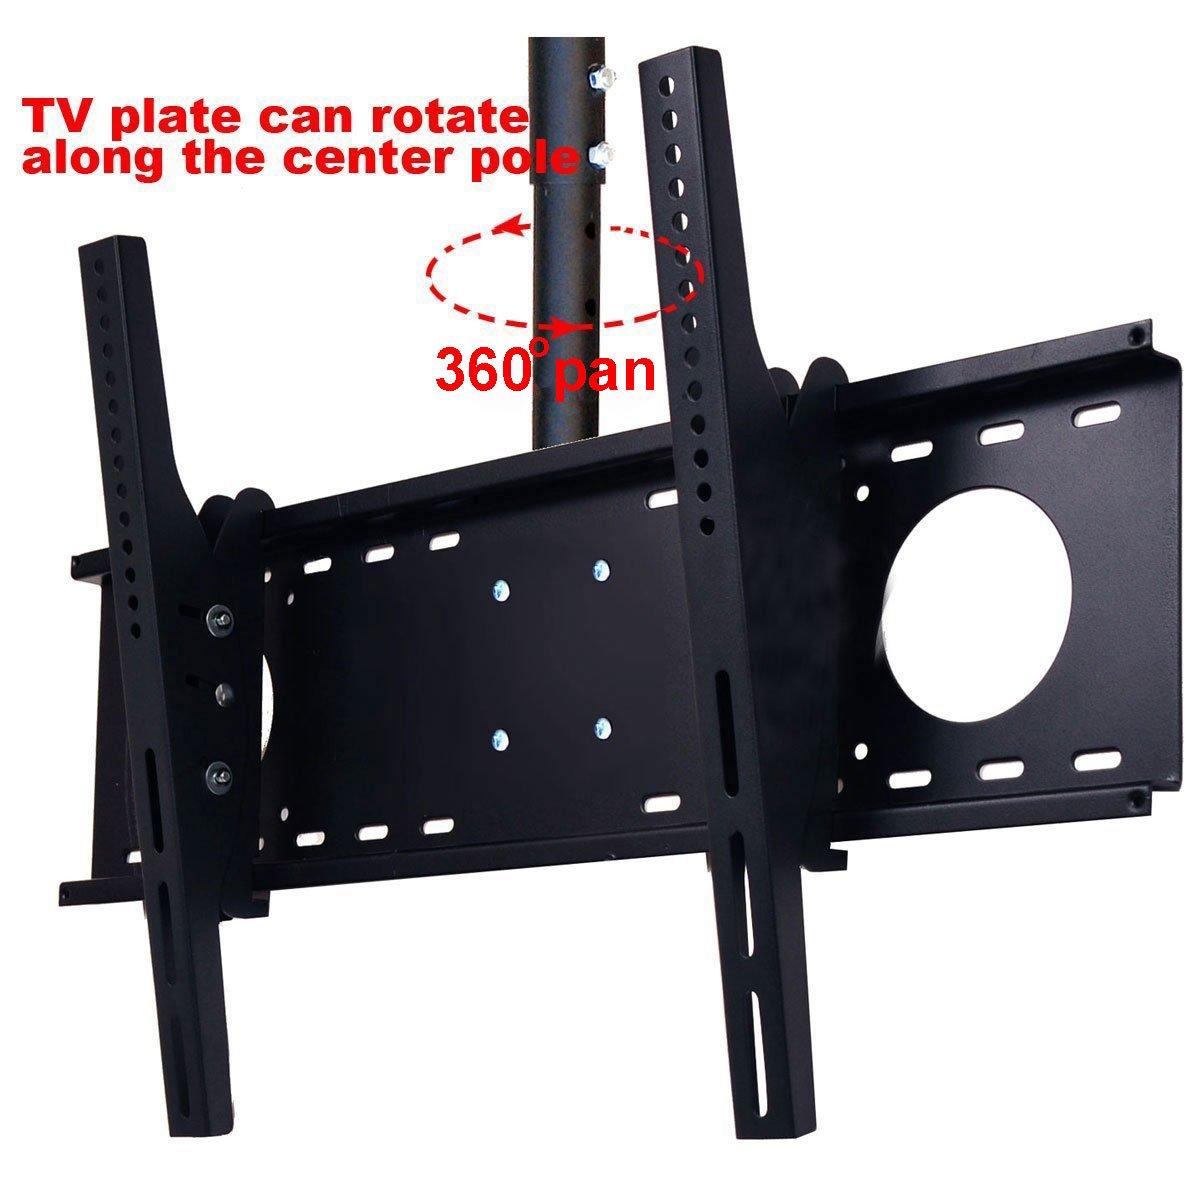 VideoSecu LCD Plasma Flat Panel TV Ceiling Mount Bracket for Most 37-60'' Plasma TV Flat Panel Displays, Some up to 75'' LED TV with VESA 200x200 400x400 600x400 680x460mm MPC53B 1S5 by VideoSecu (Image #2)